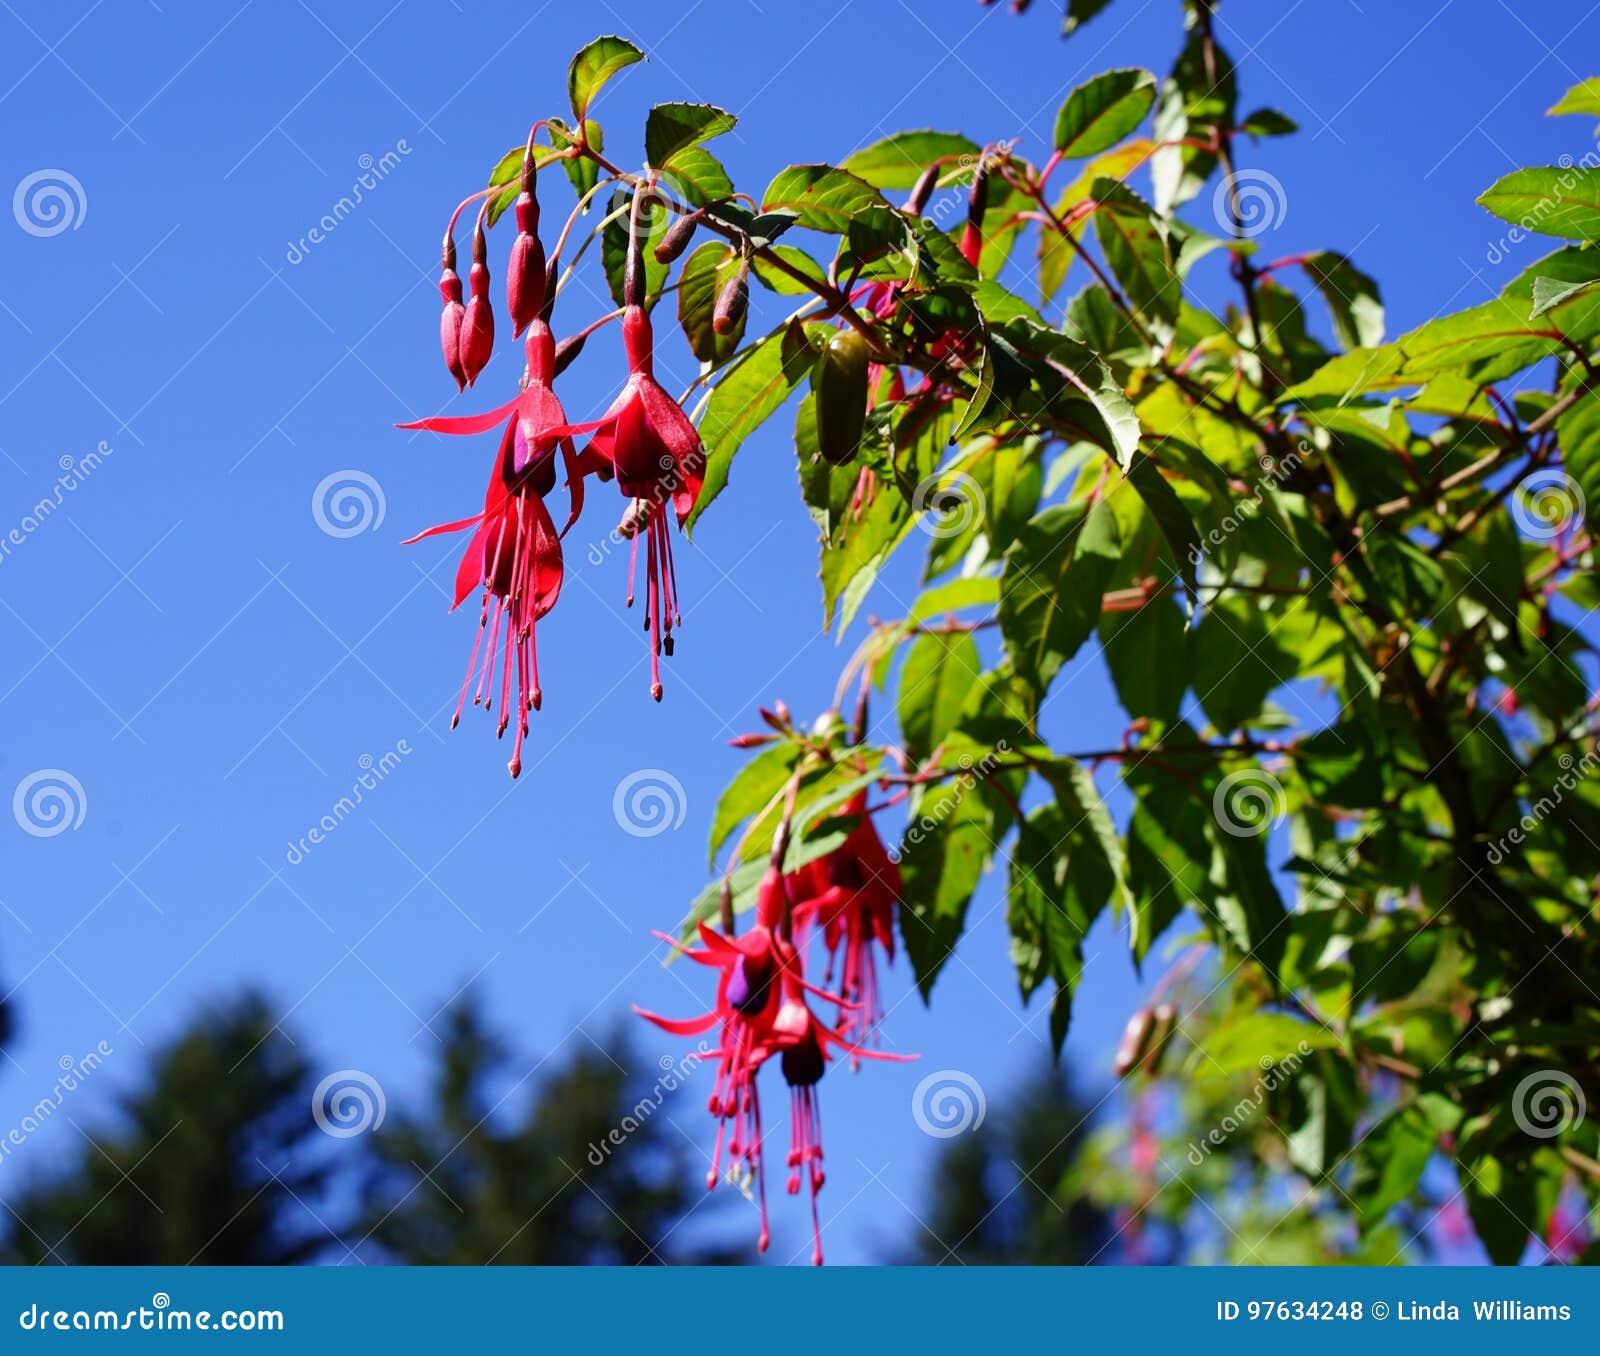 Flowering bi-color fushia shrub